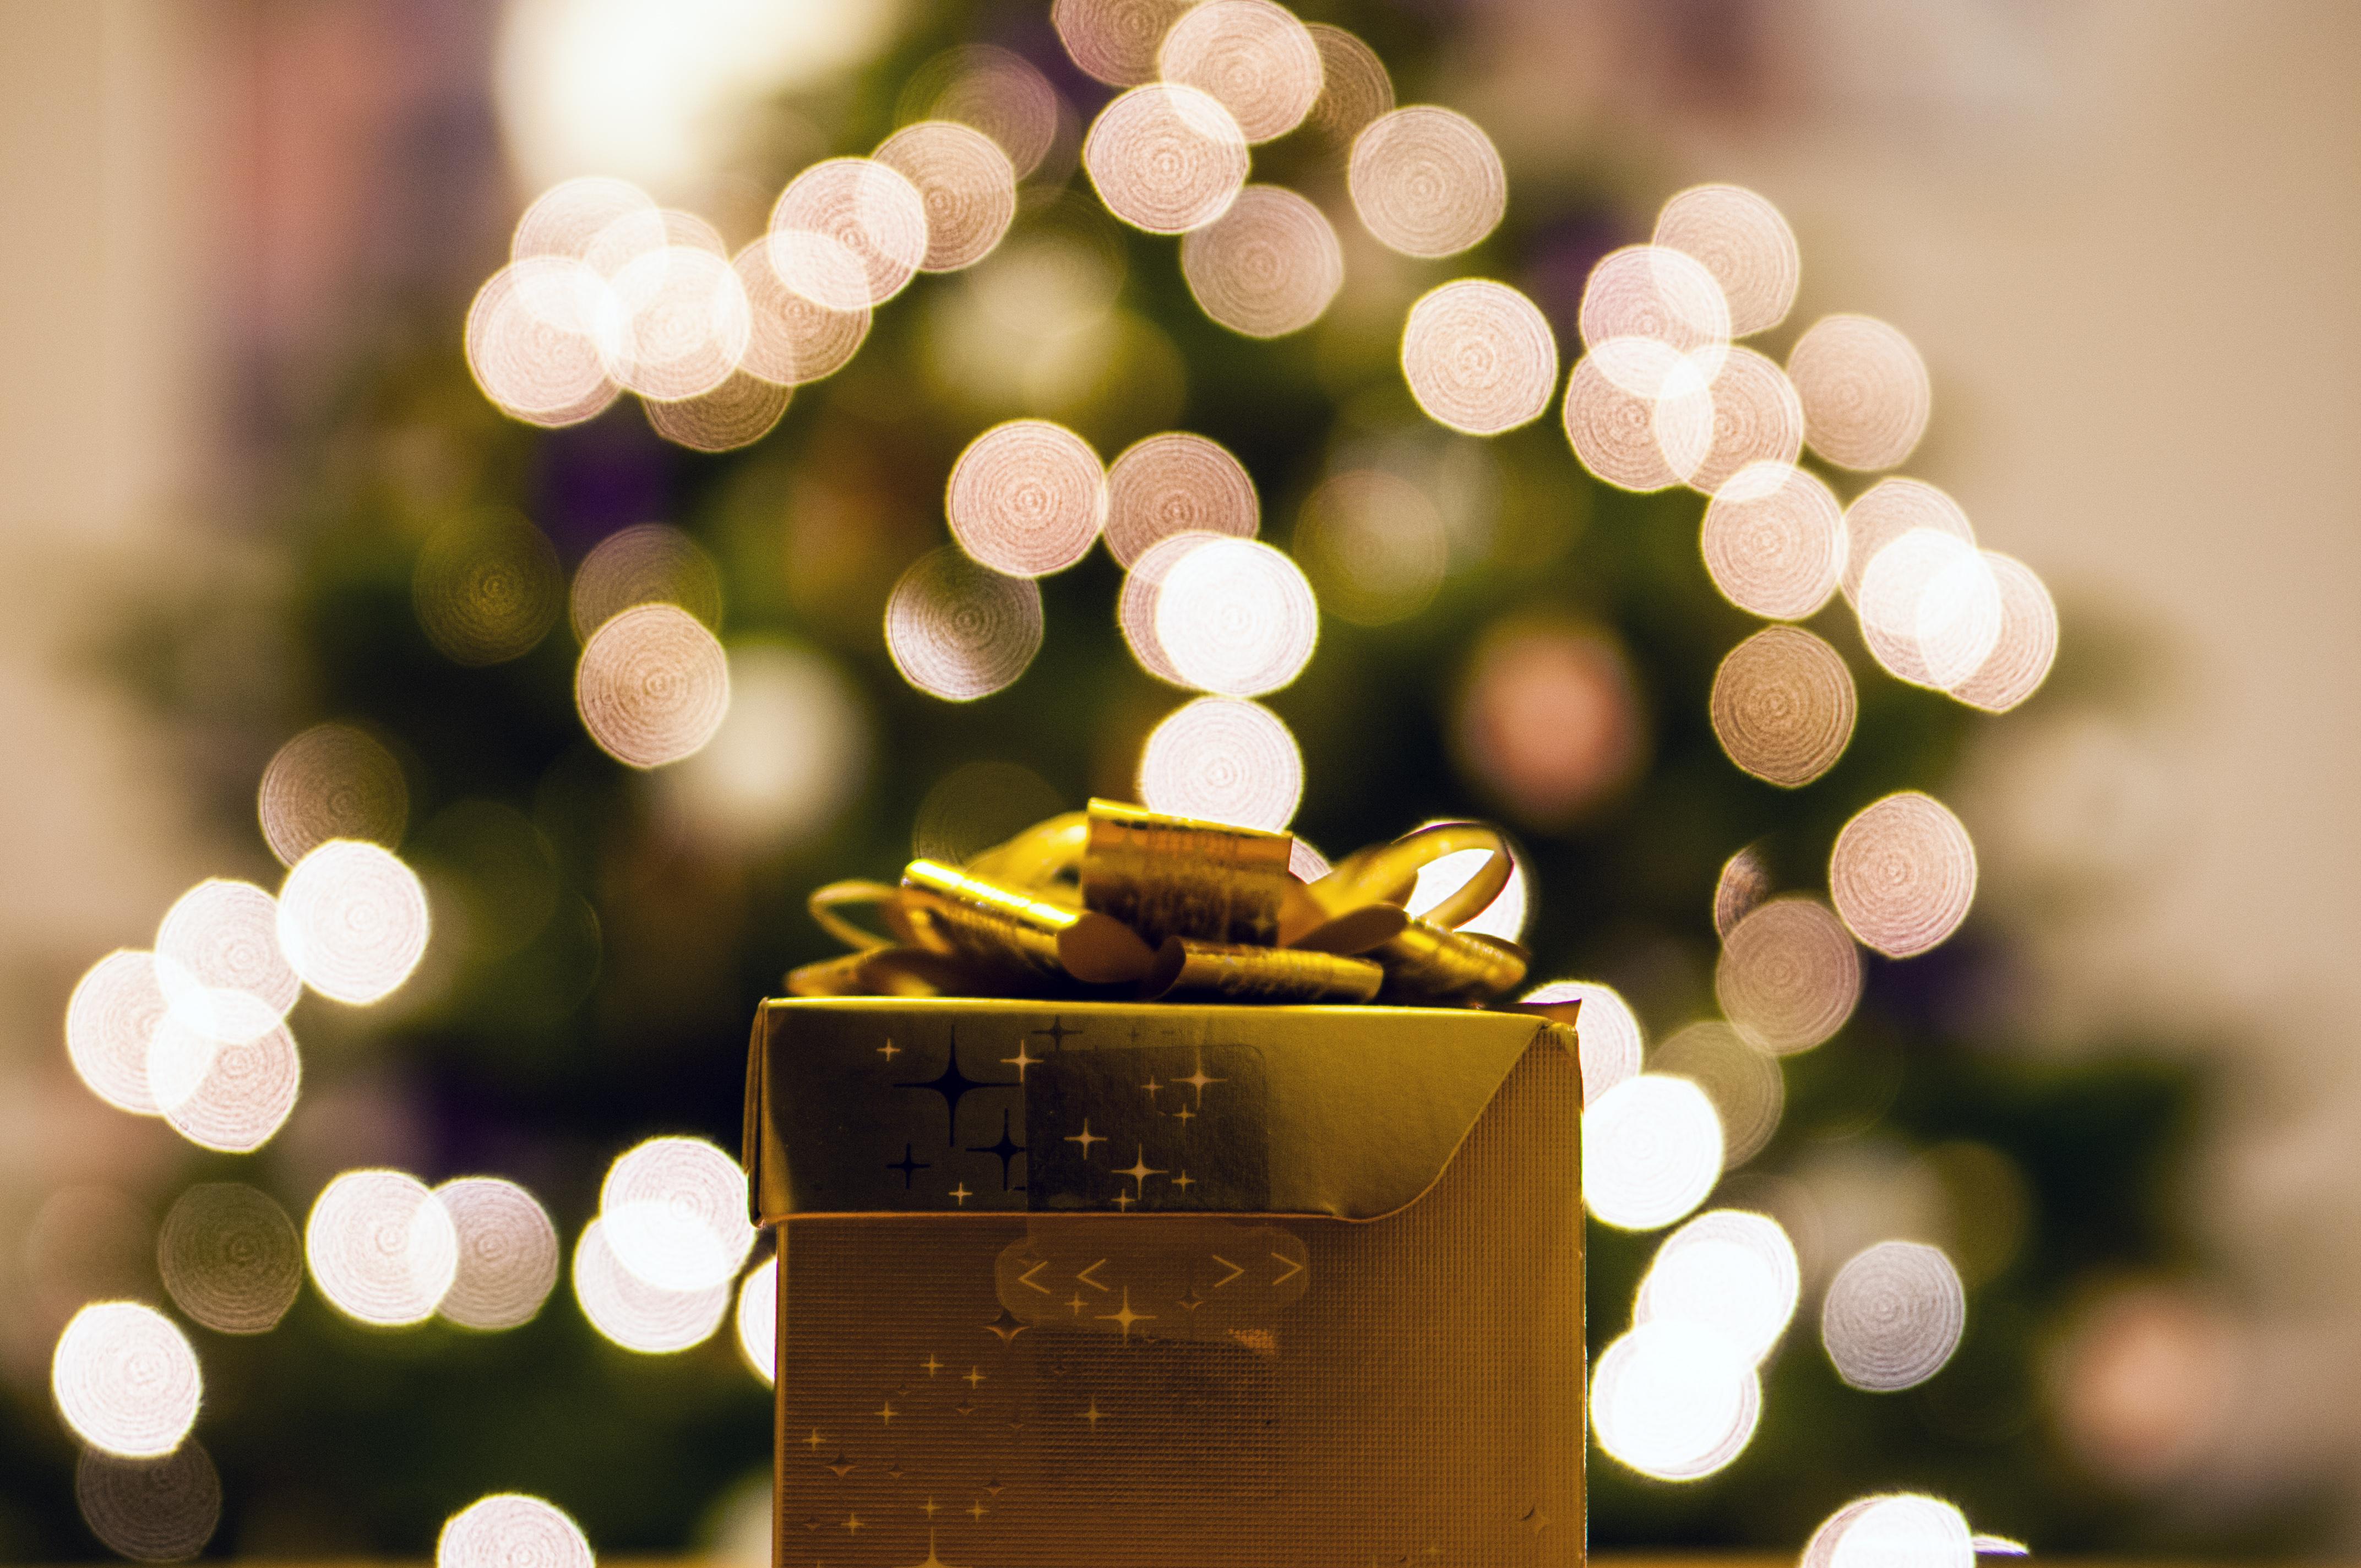 Regali Di Natale A 1 Euro.Regali Di Natale Low Cost E Fai Da Te Generazione 850 Euro